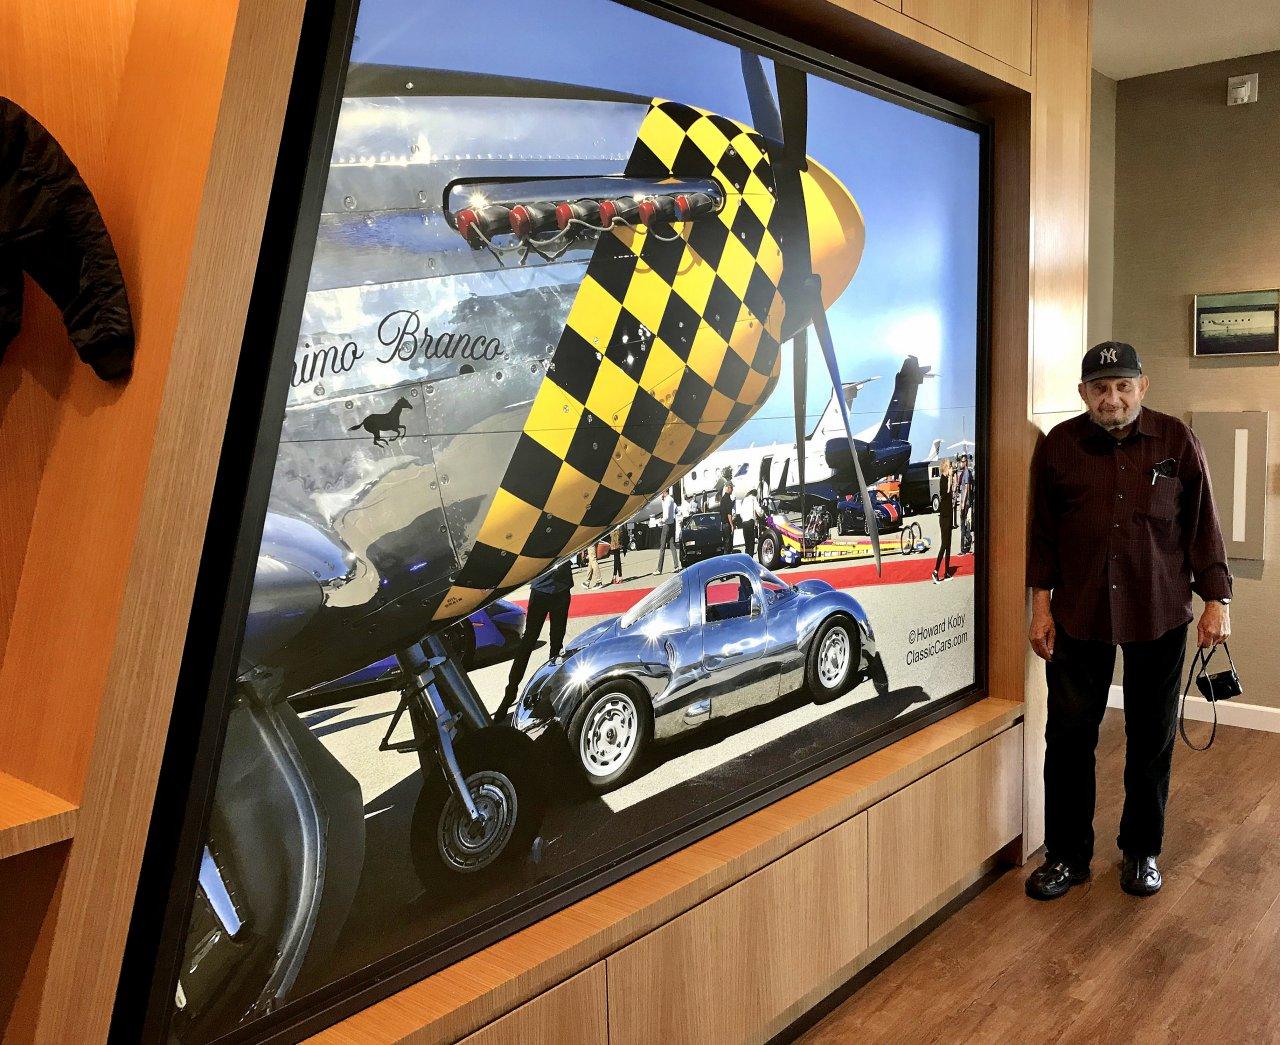 Jet Center, Linkage: McCall's Jet Center party returns, ClassicCars.com Journal